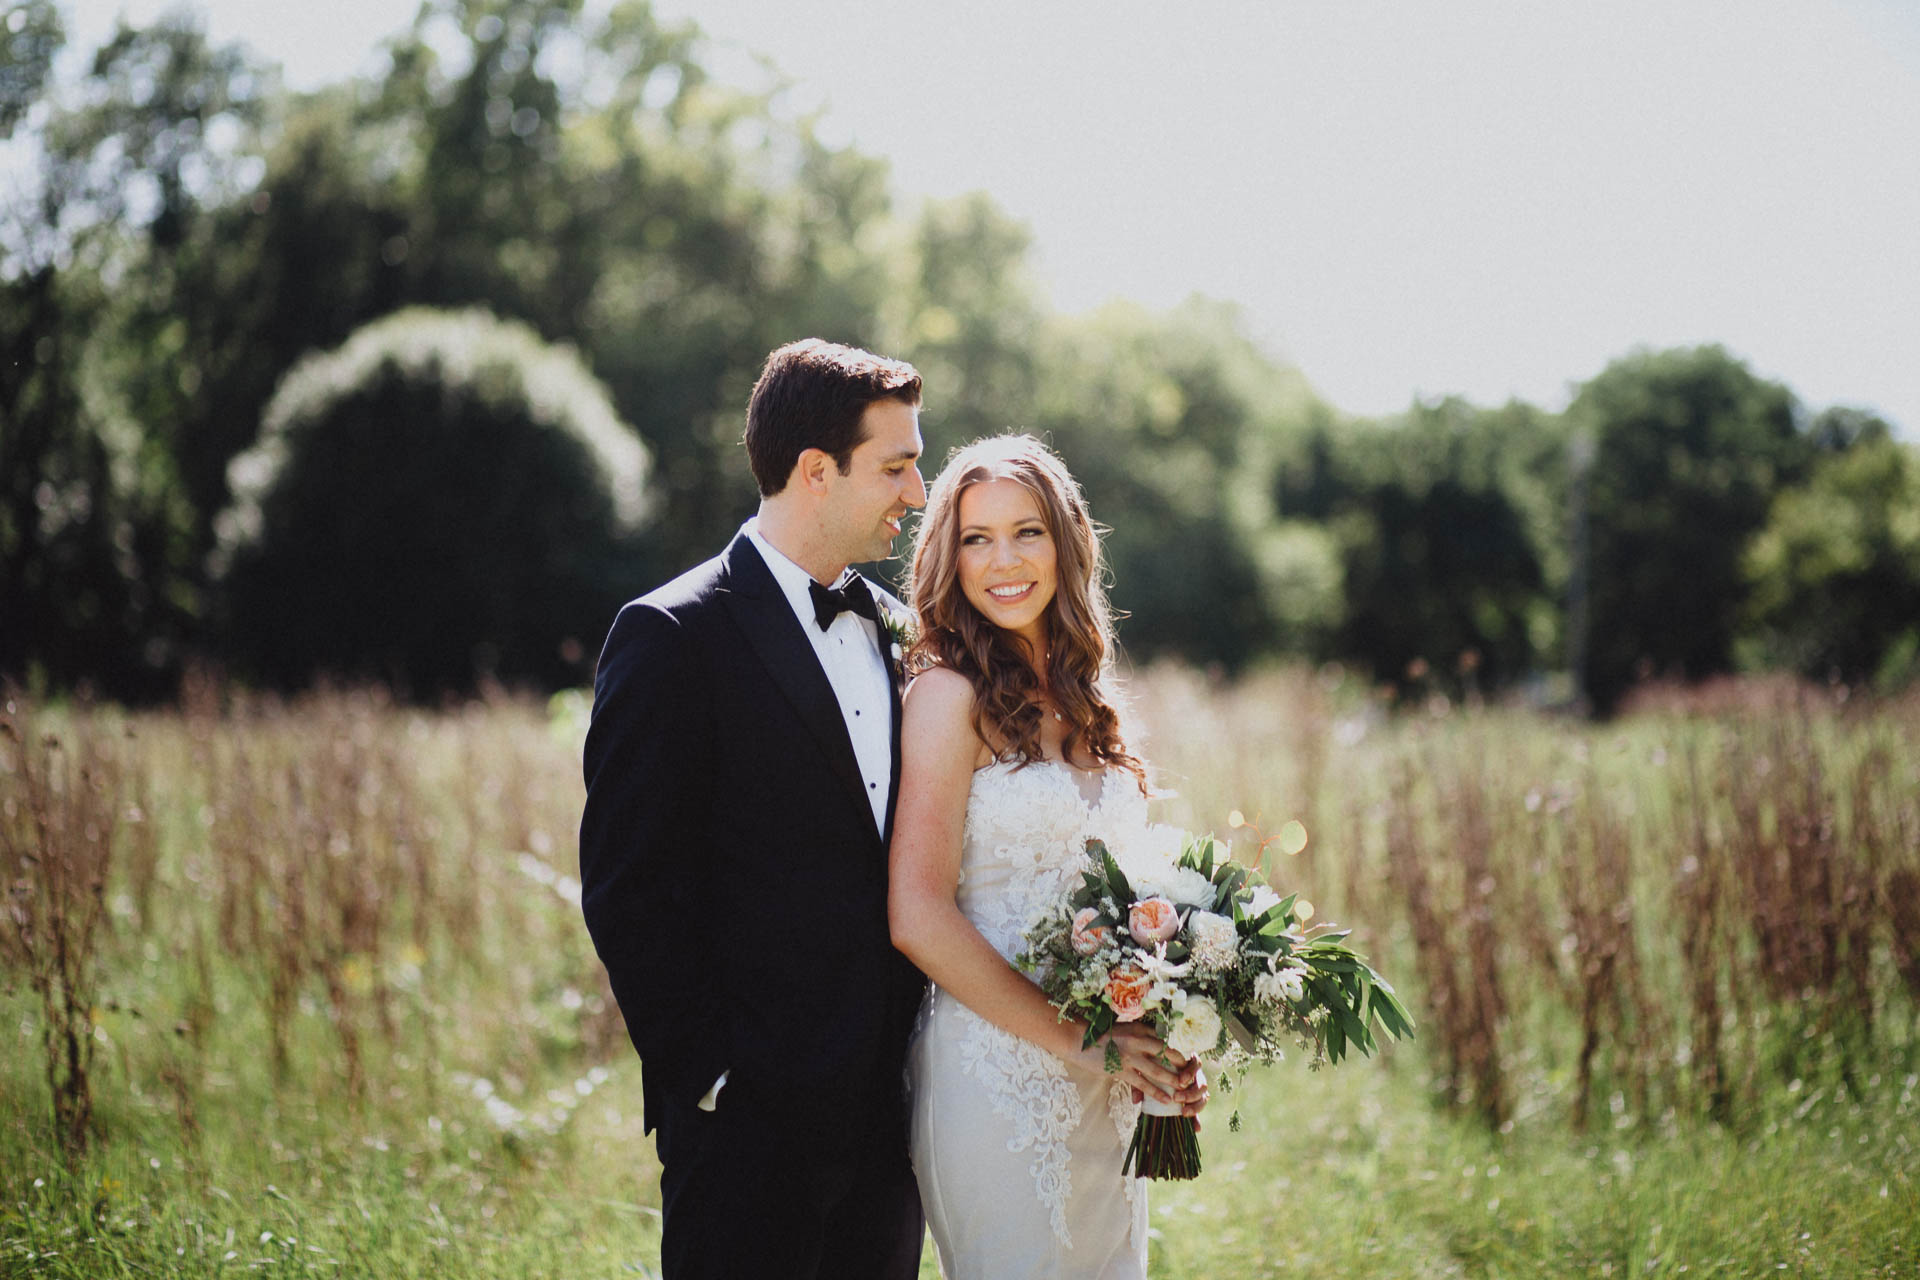 Keri-Joseph-Top-of-the-Market-Wedding-123@2x.jpg